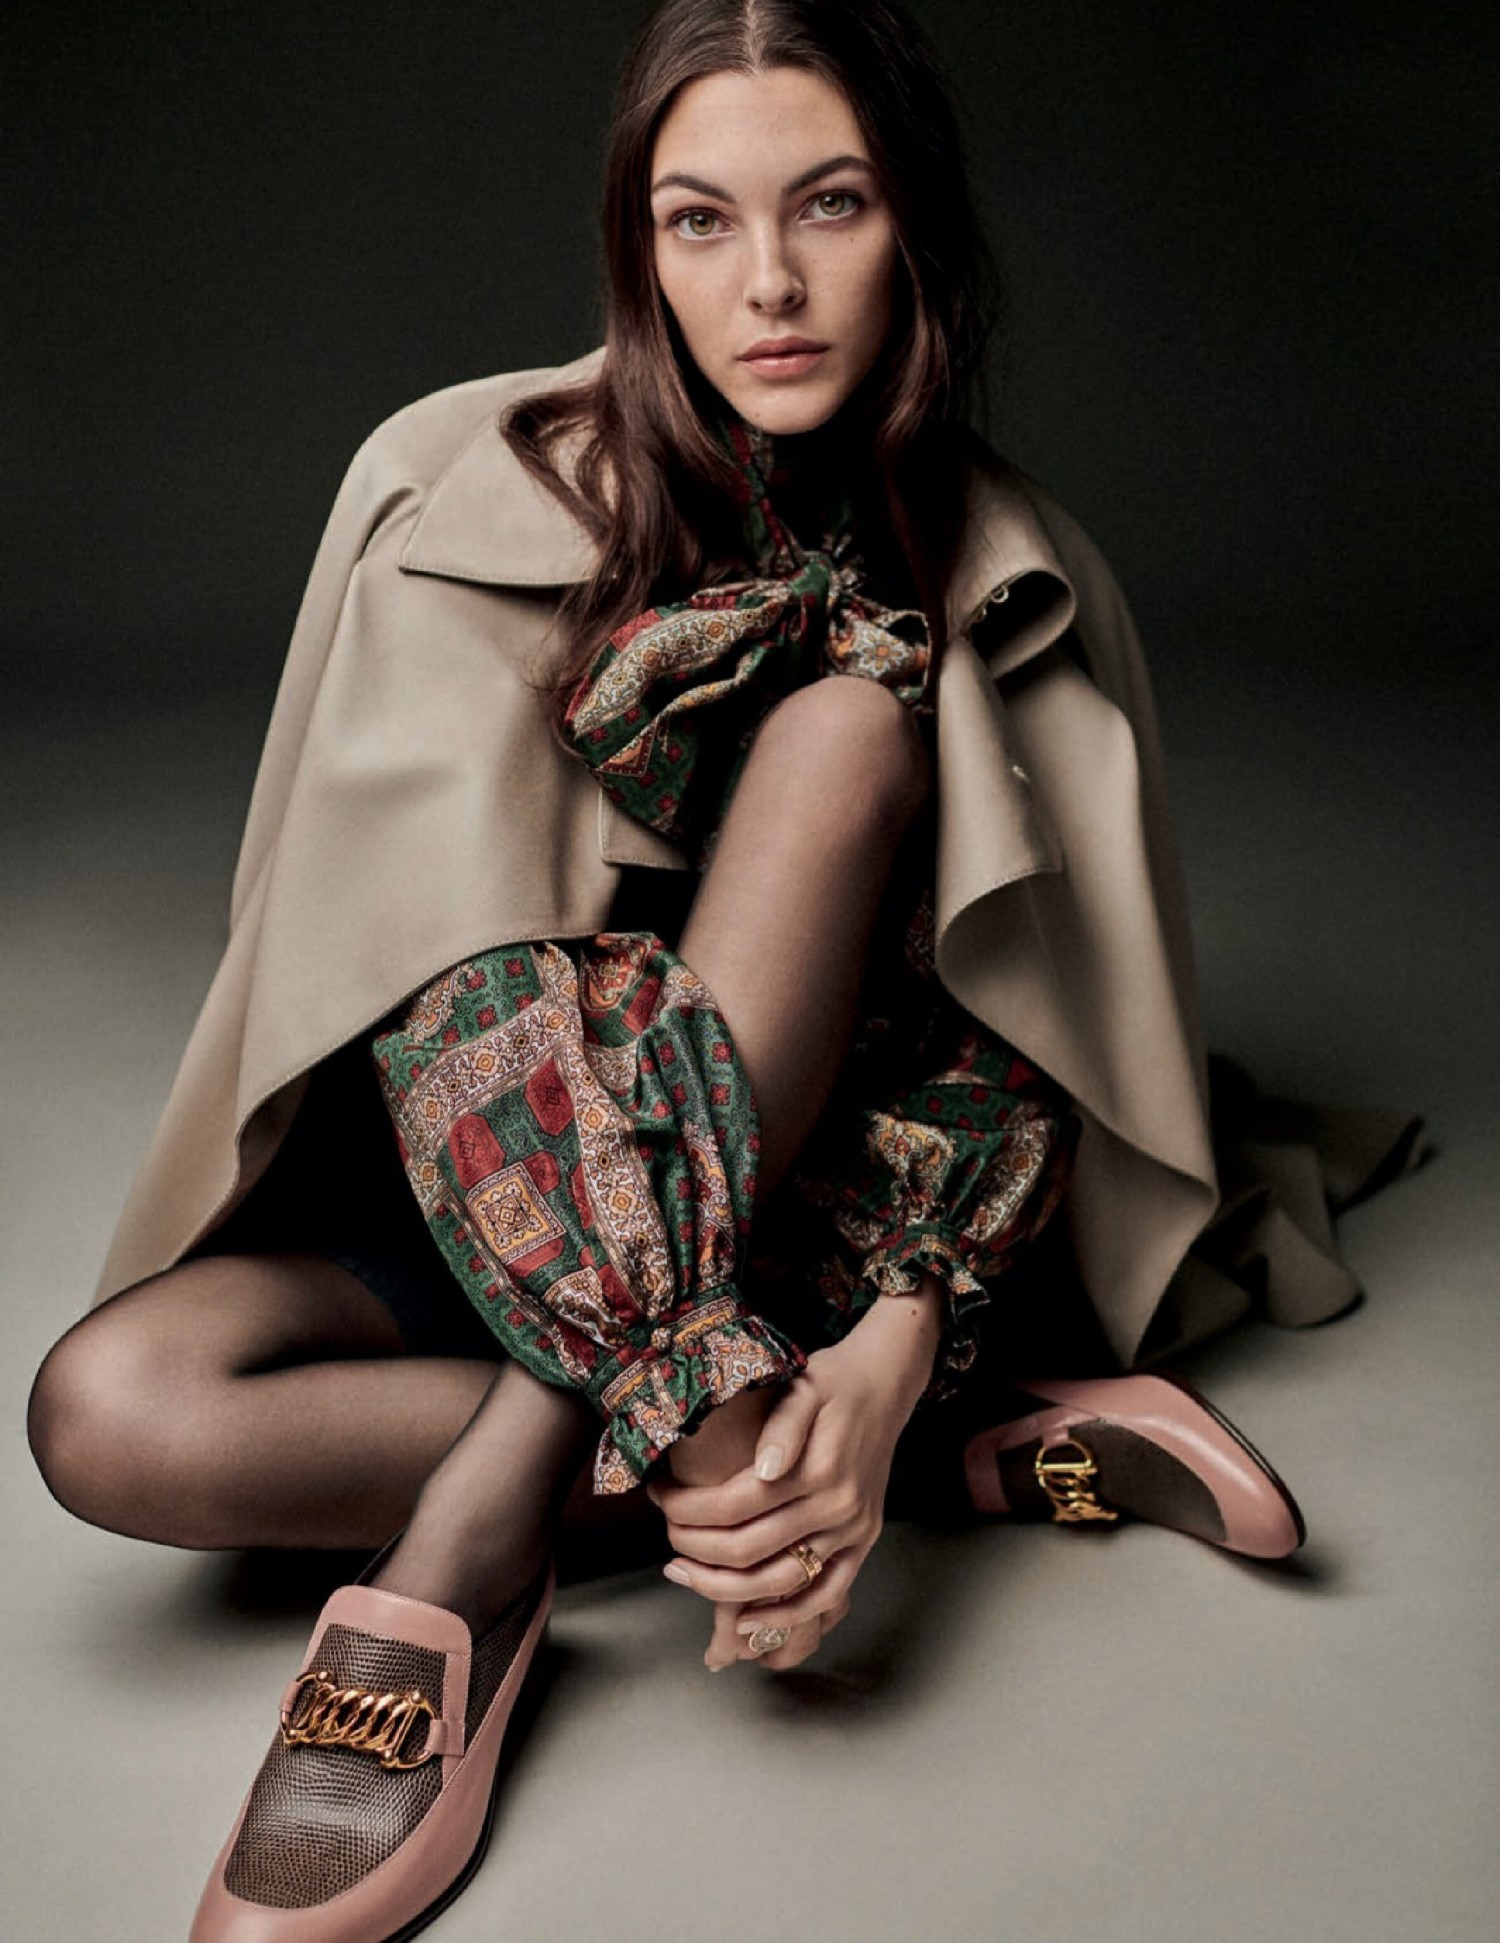 Vittoria Ceretti by Giampaolo Sgura for Vogue Paris Sept 2019 (7).jpg